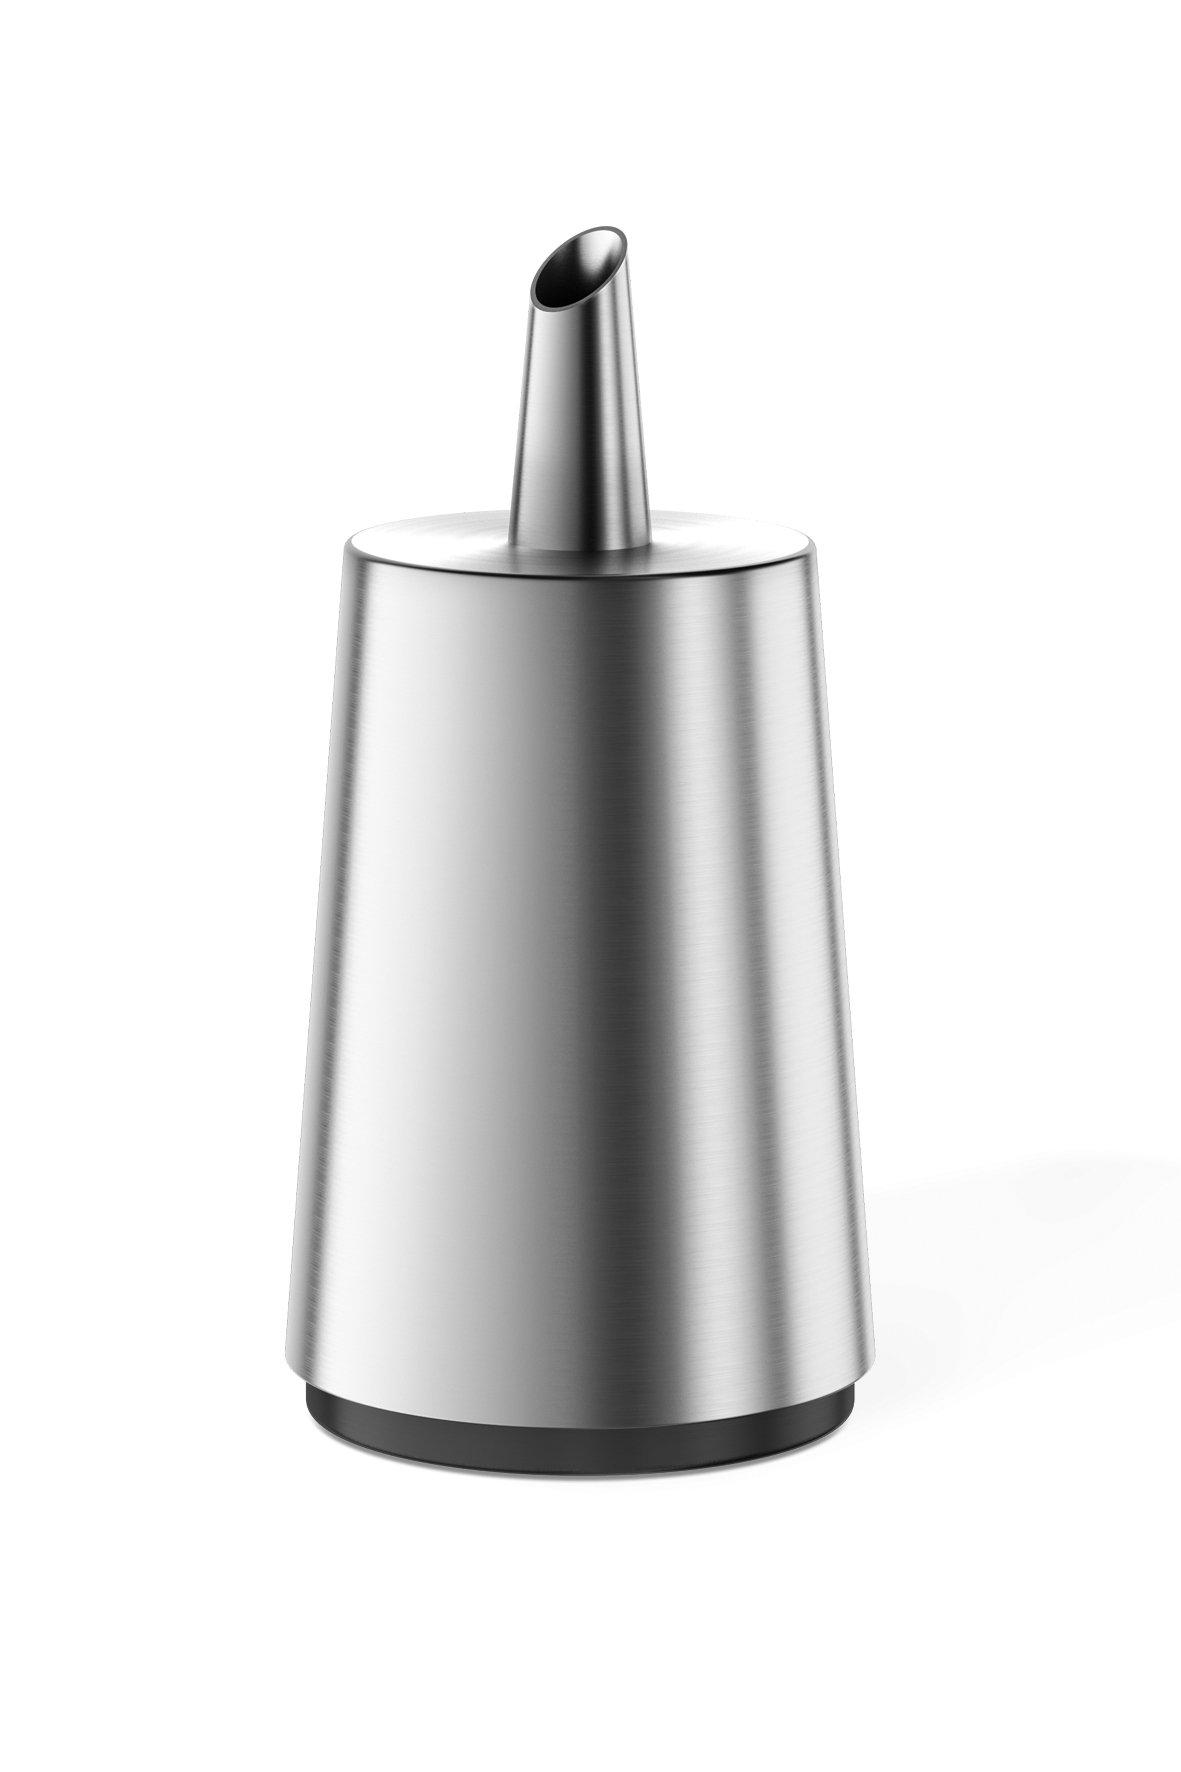 ZACK 20633 Toco Sugar Dispenser, 5.51 by 2.76-Inch